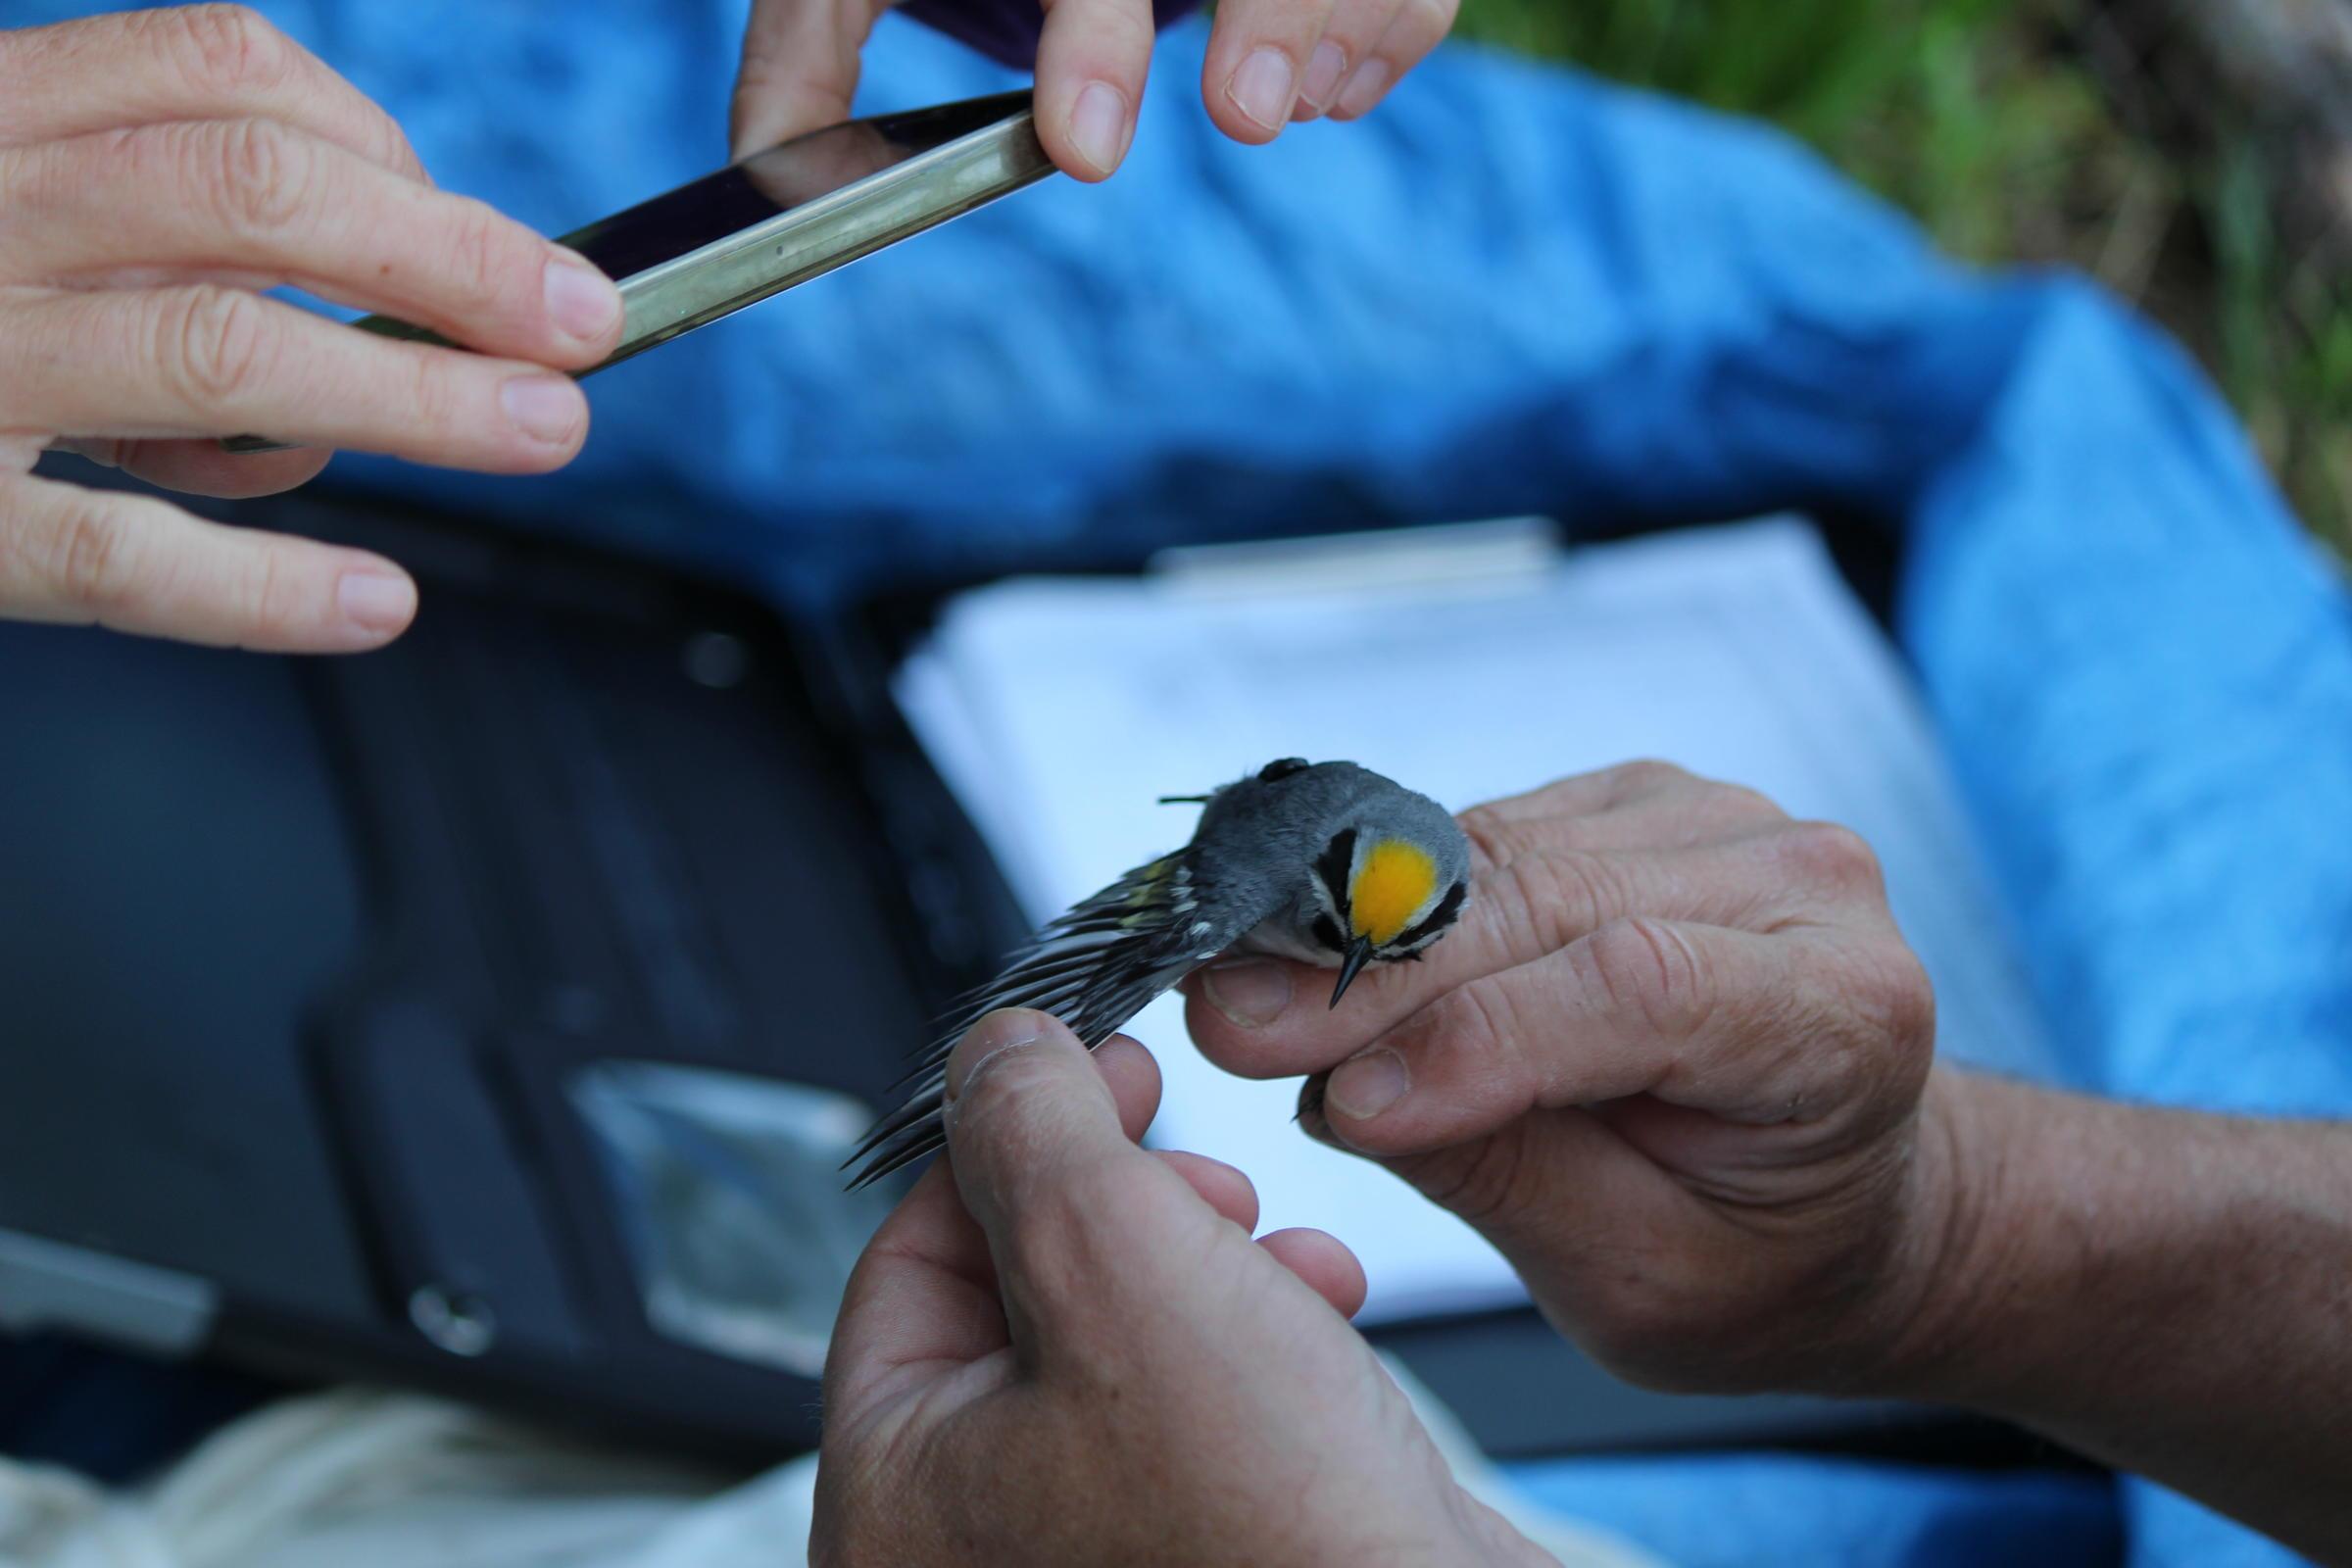 Golden-winged Warbler Geolocator Placement